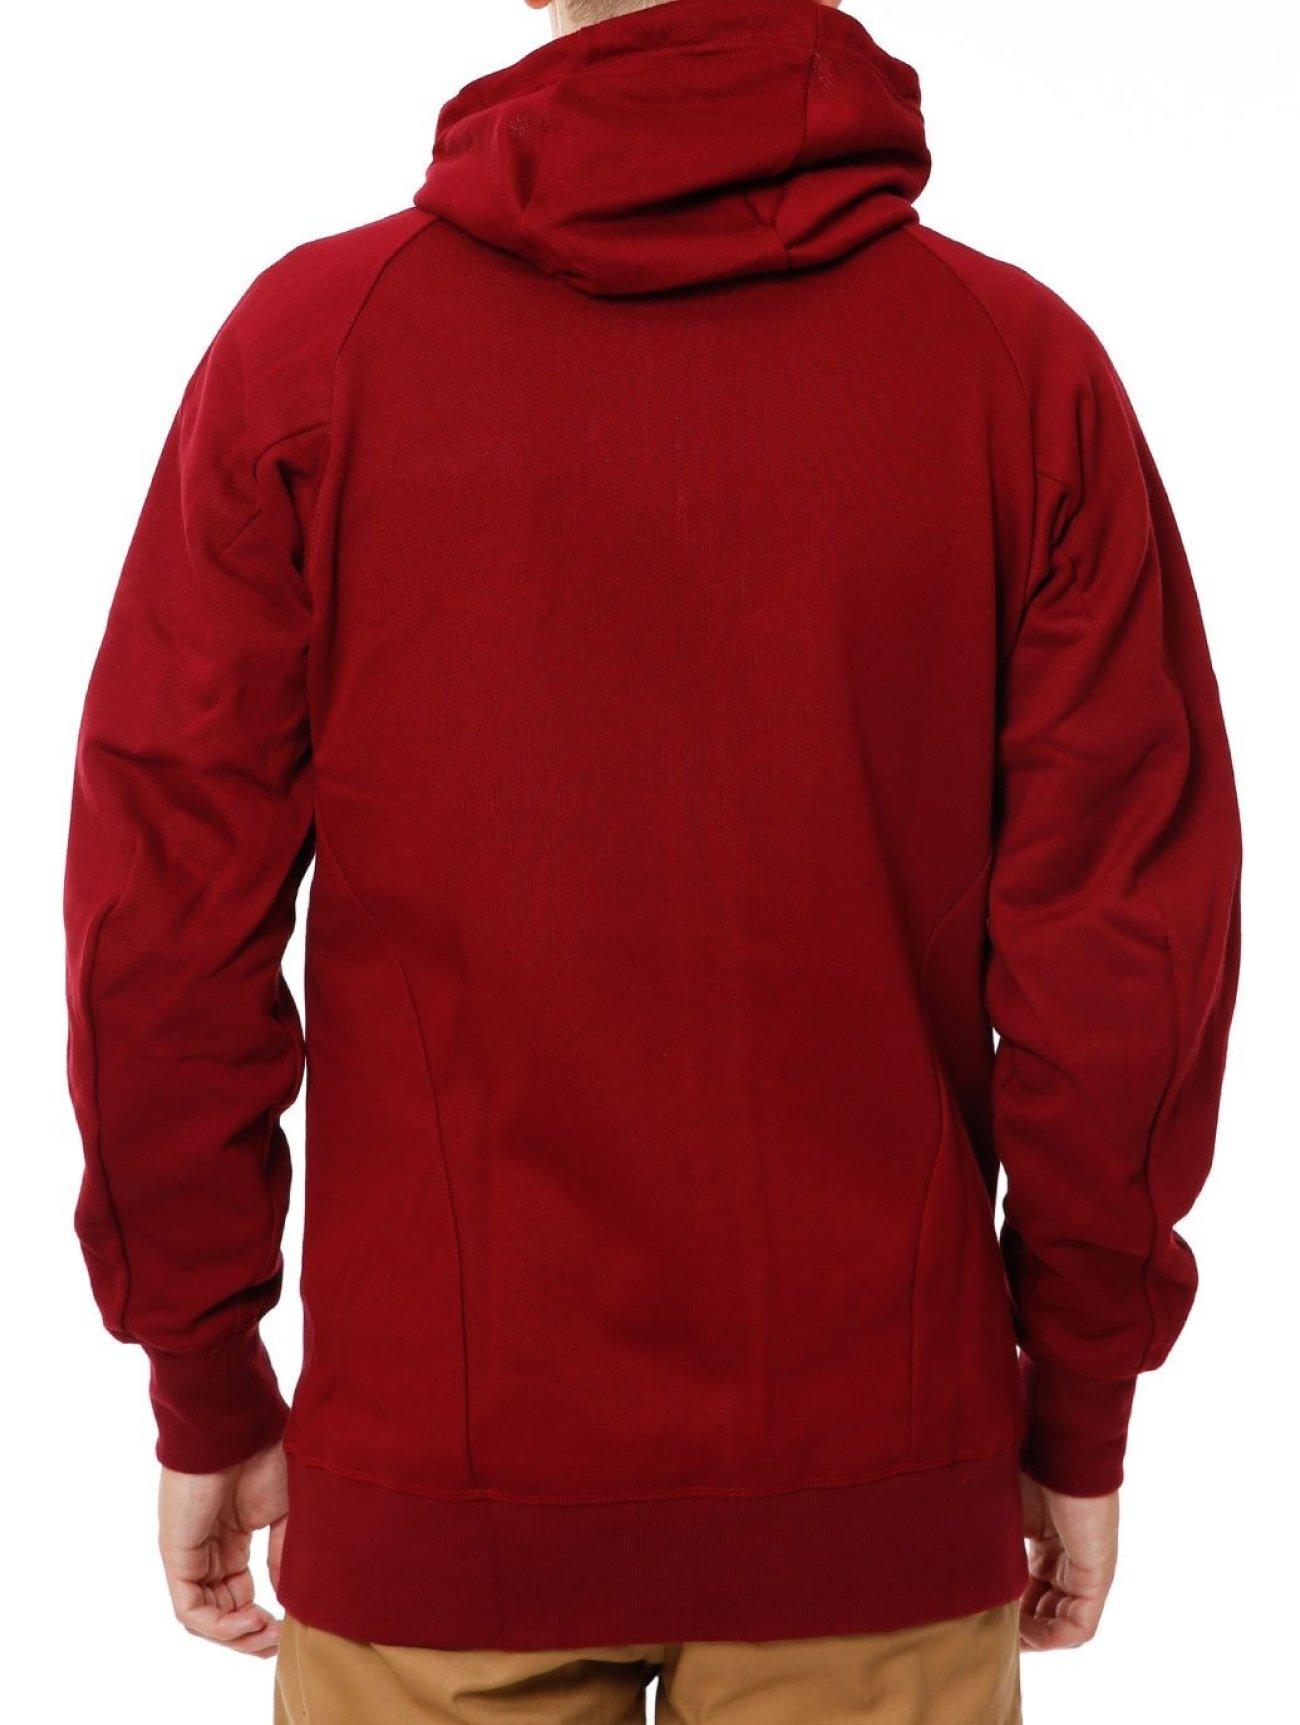 adidas Originals | XBYO  rouge Homme Sweat capuche  554211| Homme Hauts